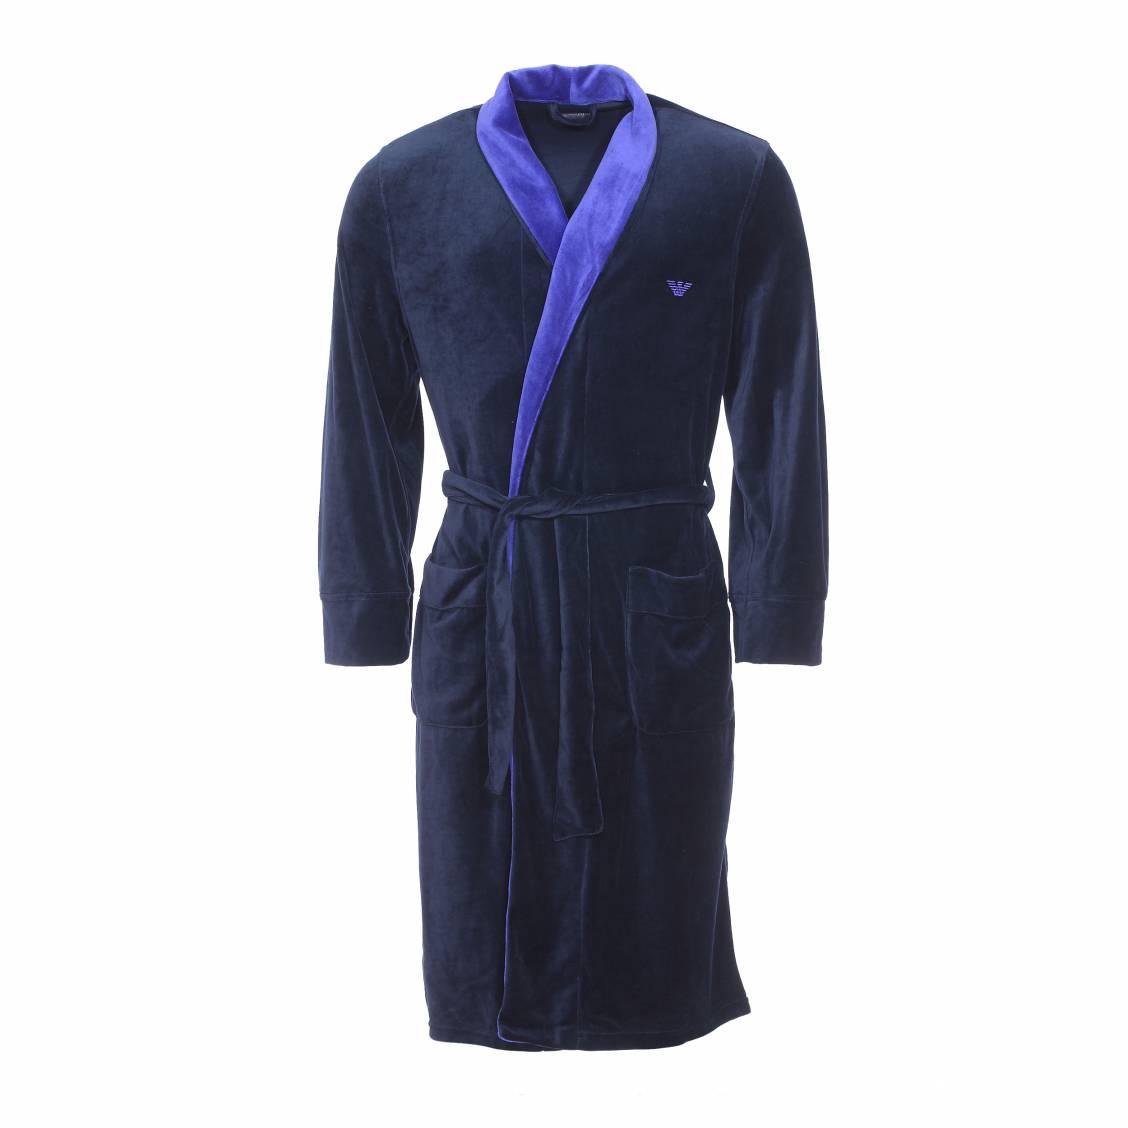 robe de chambre emporio armani en velours bleu marine rue des hommes. Black Bedroom Furniture Sets. Home Design Ideas